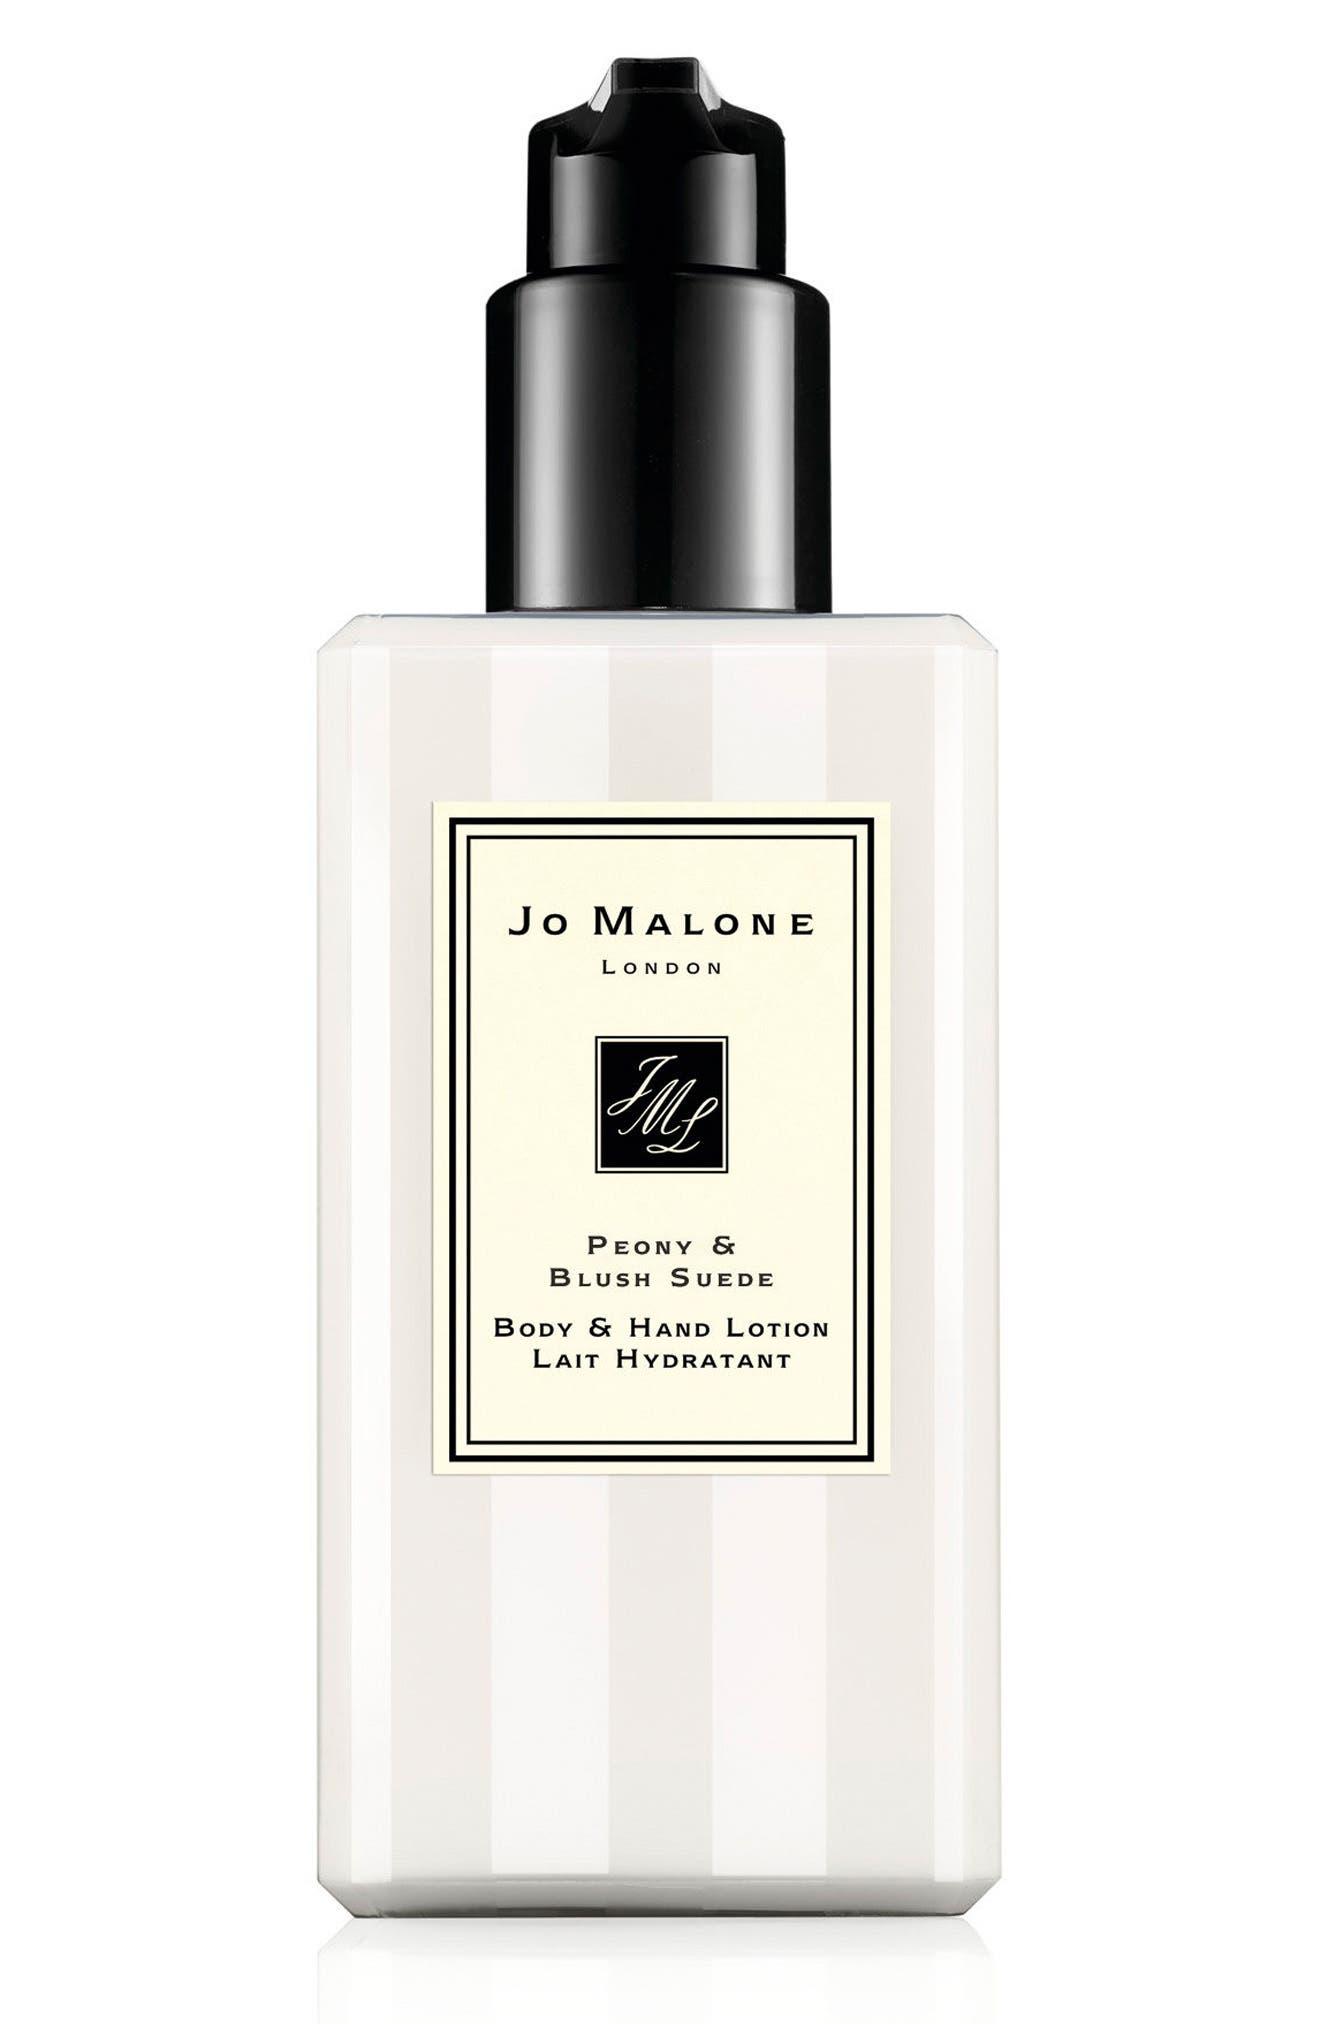 Jo Malone London™ Peony & Blush Suede Body & Hand Lotion